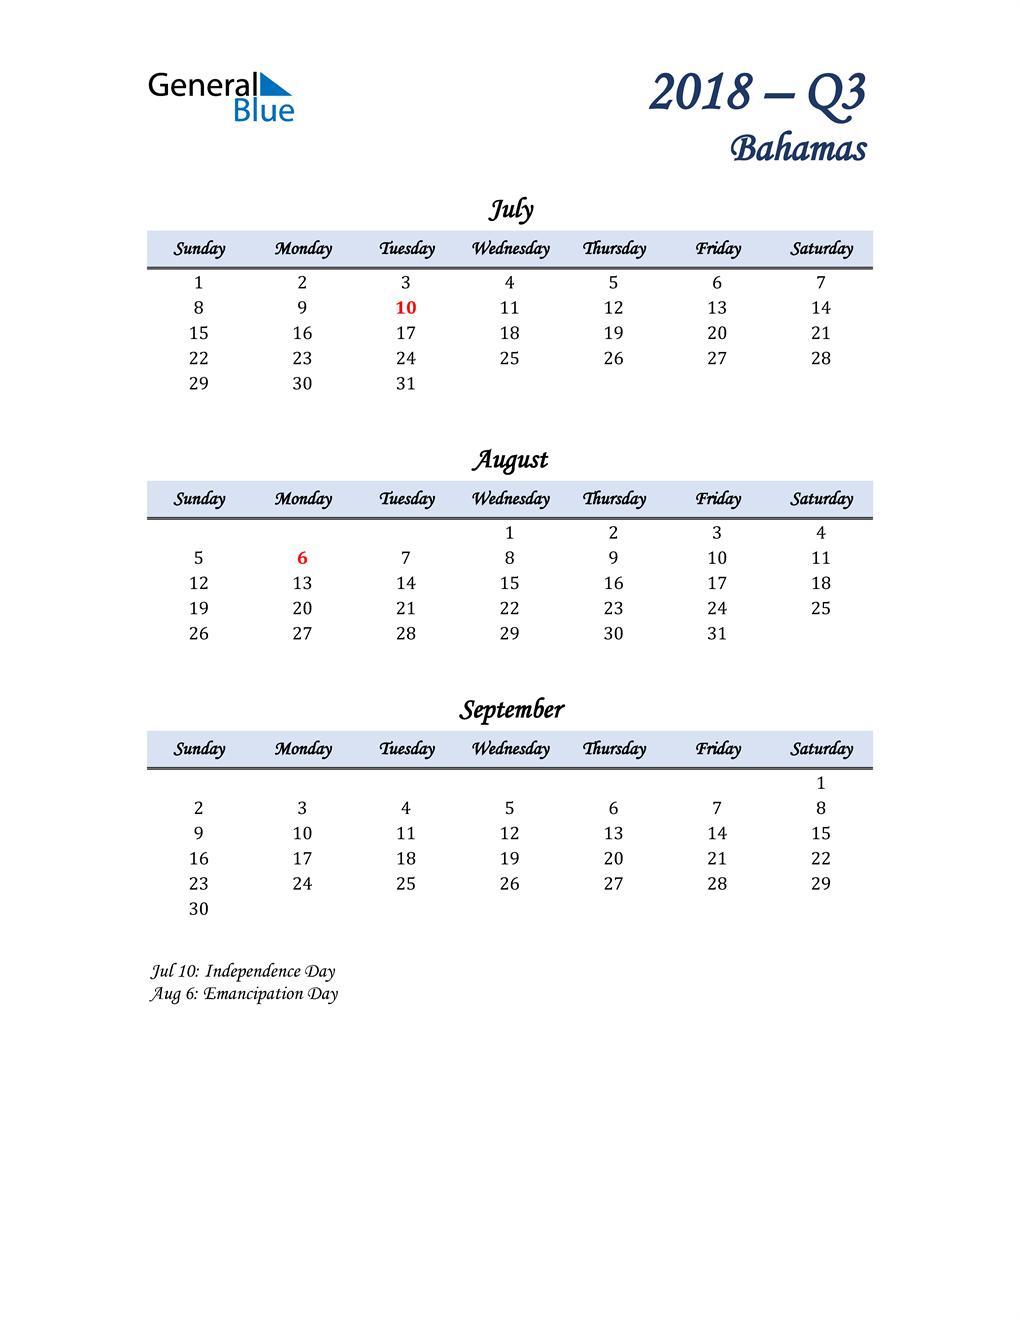 July, August, and September Calendar for Bahamas